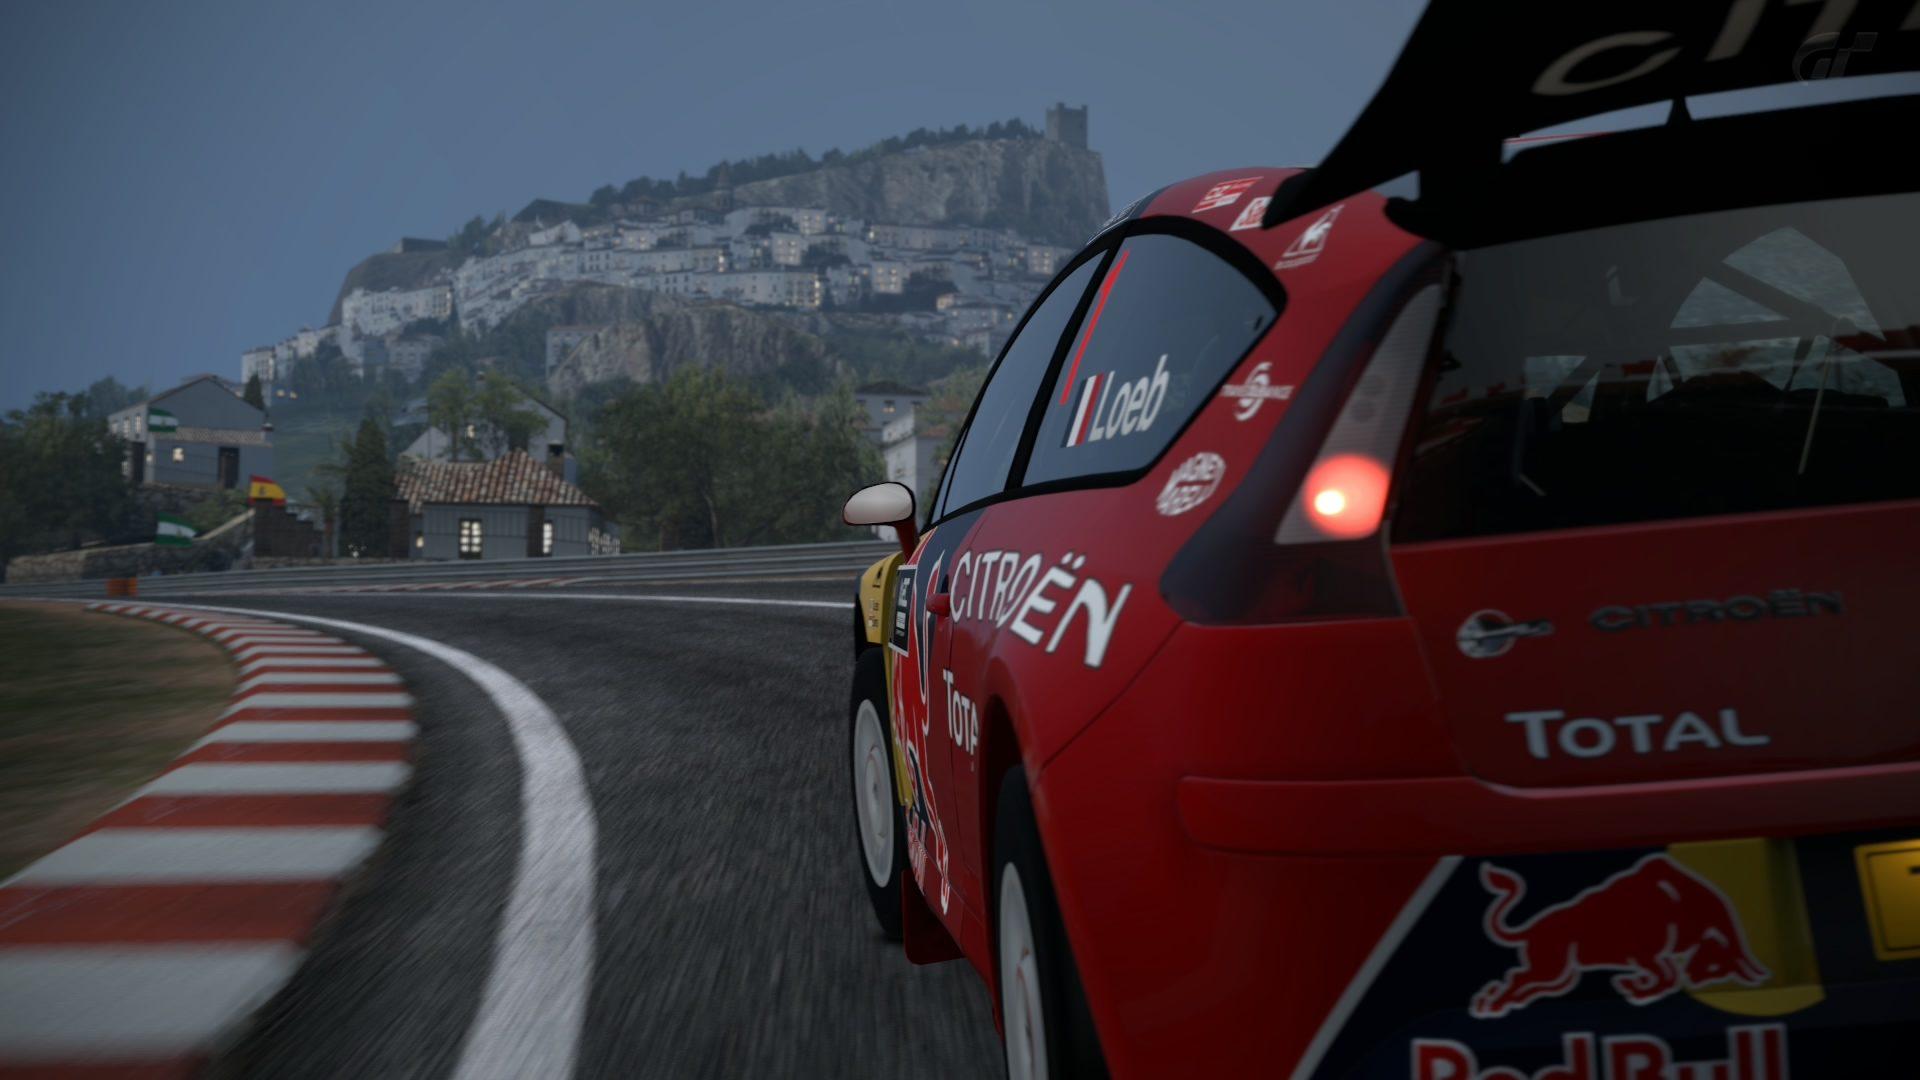 Circuito de la Sierra - Citroen C4 2.jpg